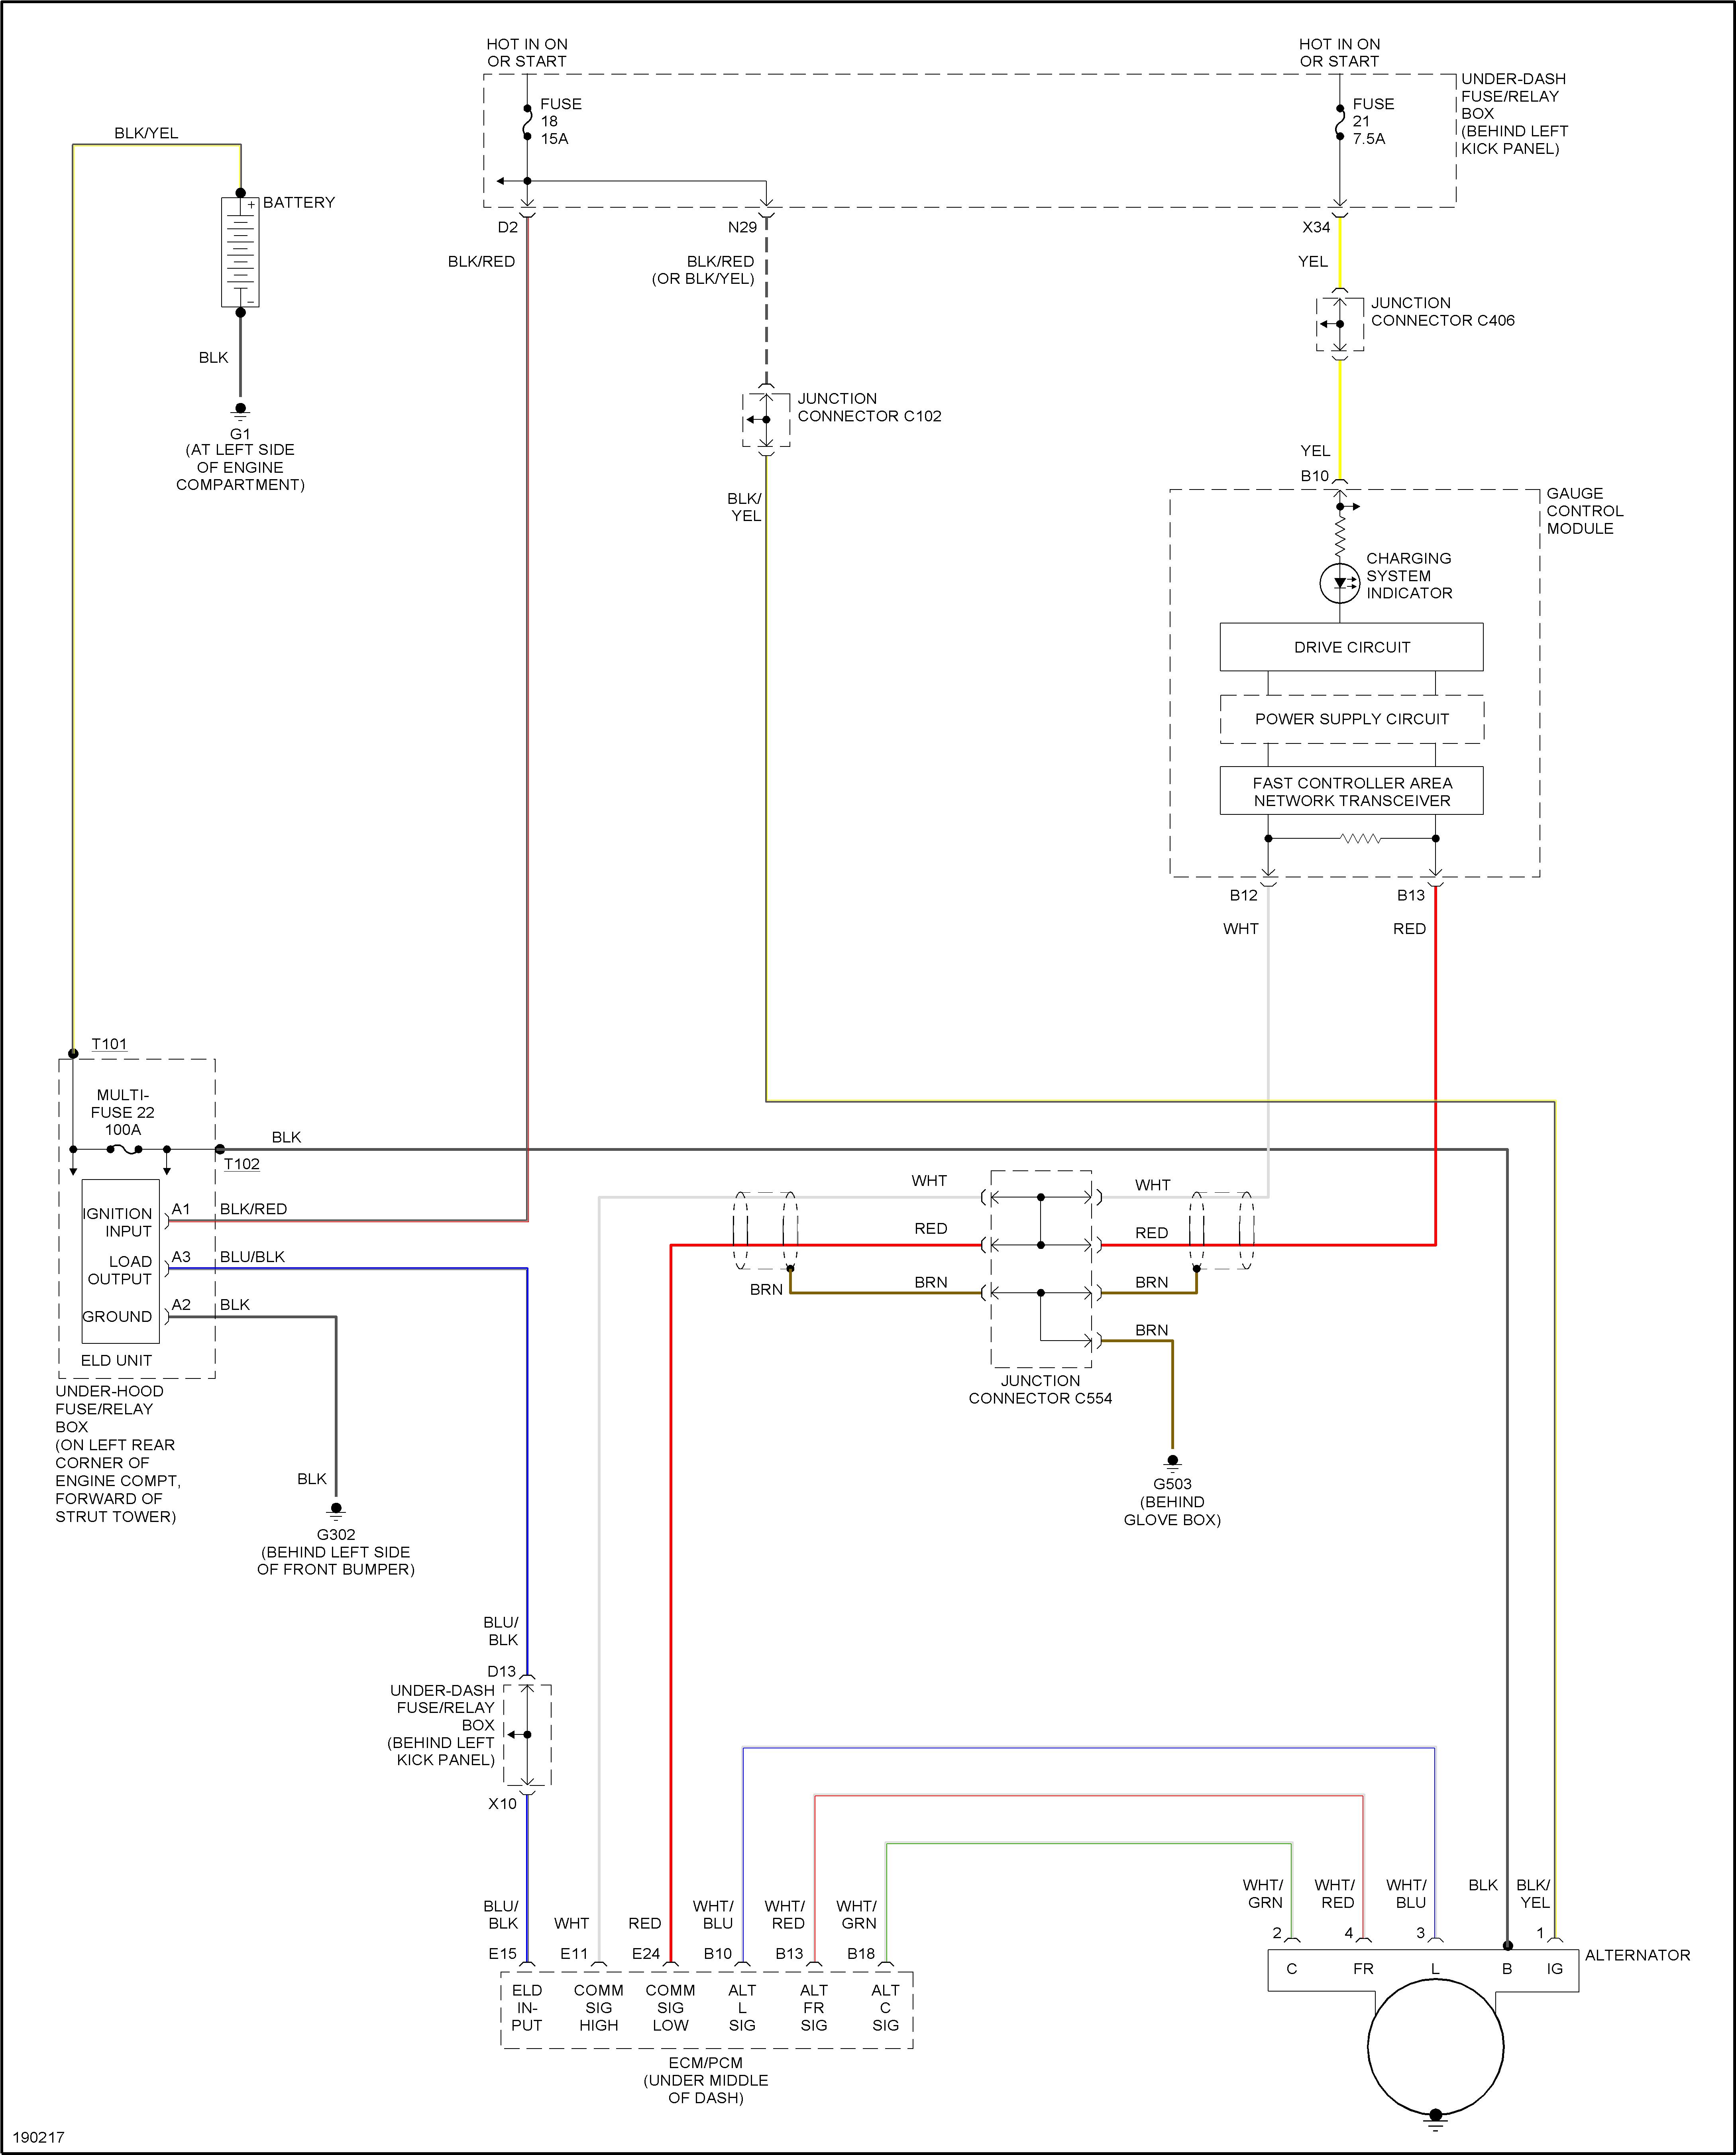 fd17b9c1-d588-43a9-b02e-485d7ab84138_alternator.png